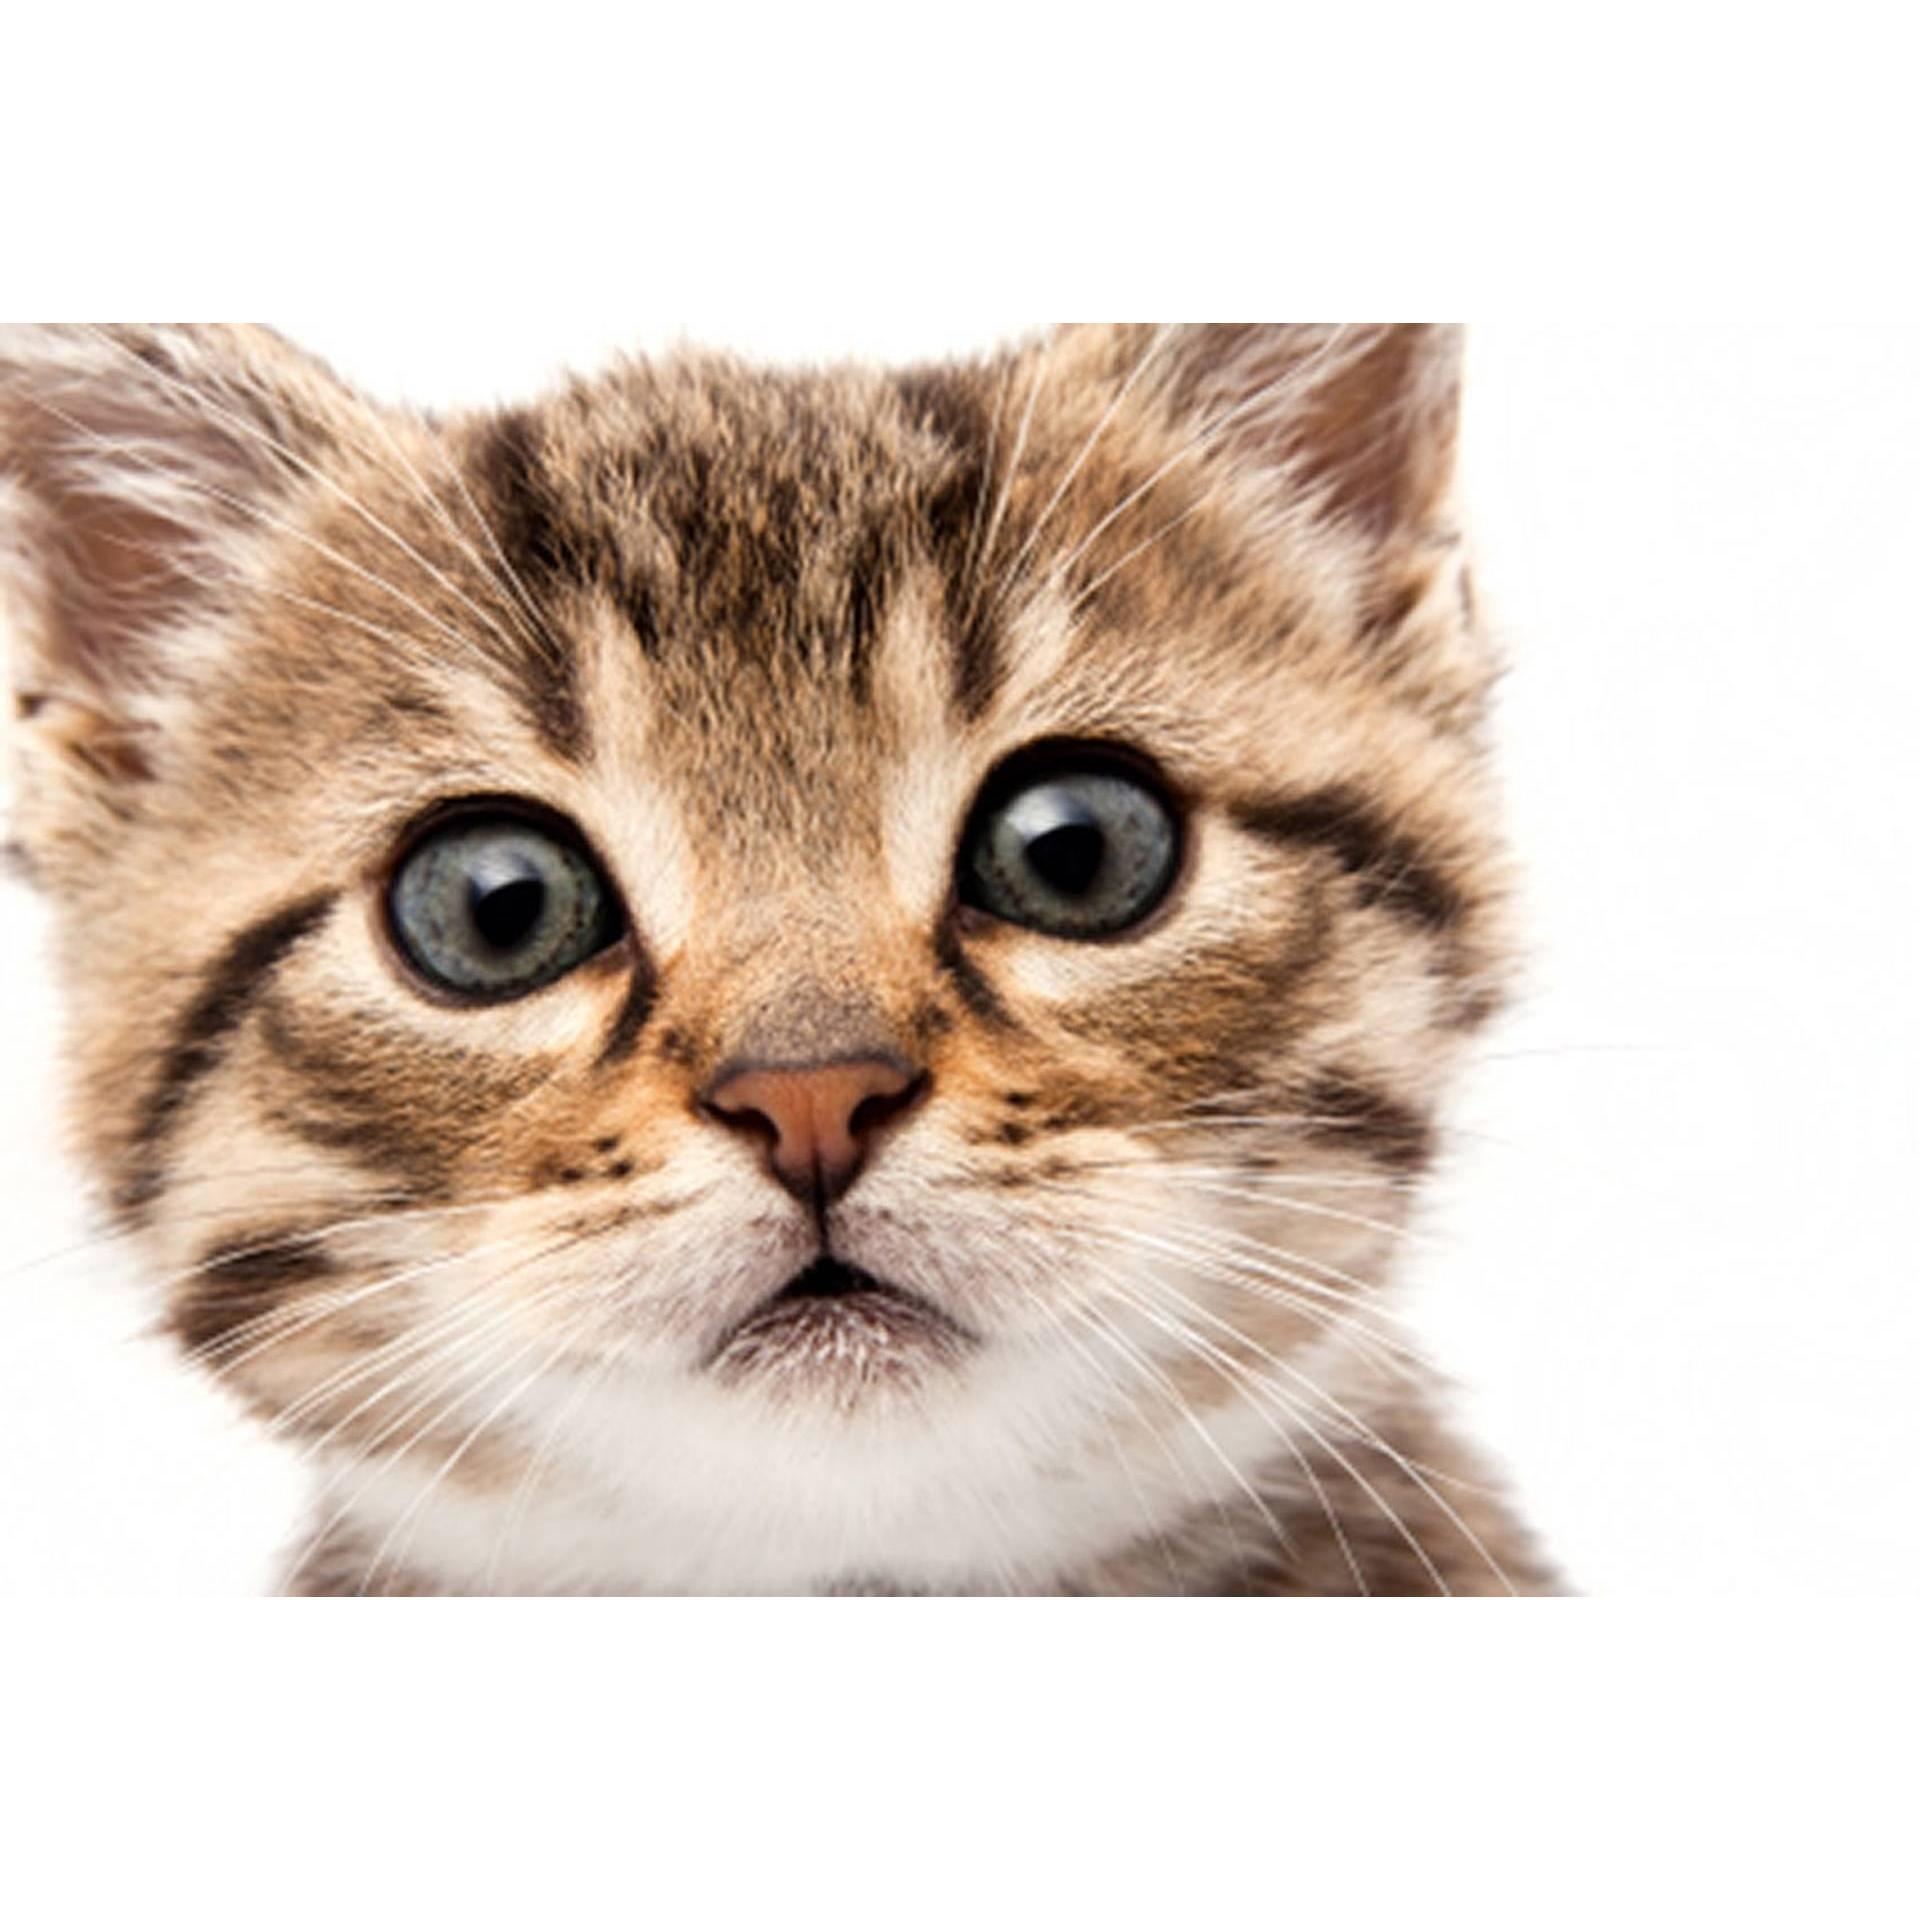 Cosy Cat Care - Rushden, Northamptonshire NN10 8EF - 07446 329704 | ShowMeLocal.com